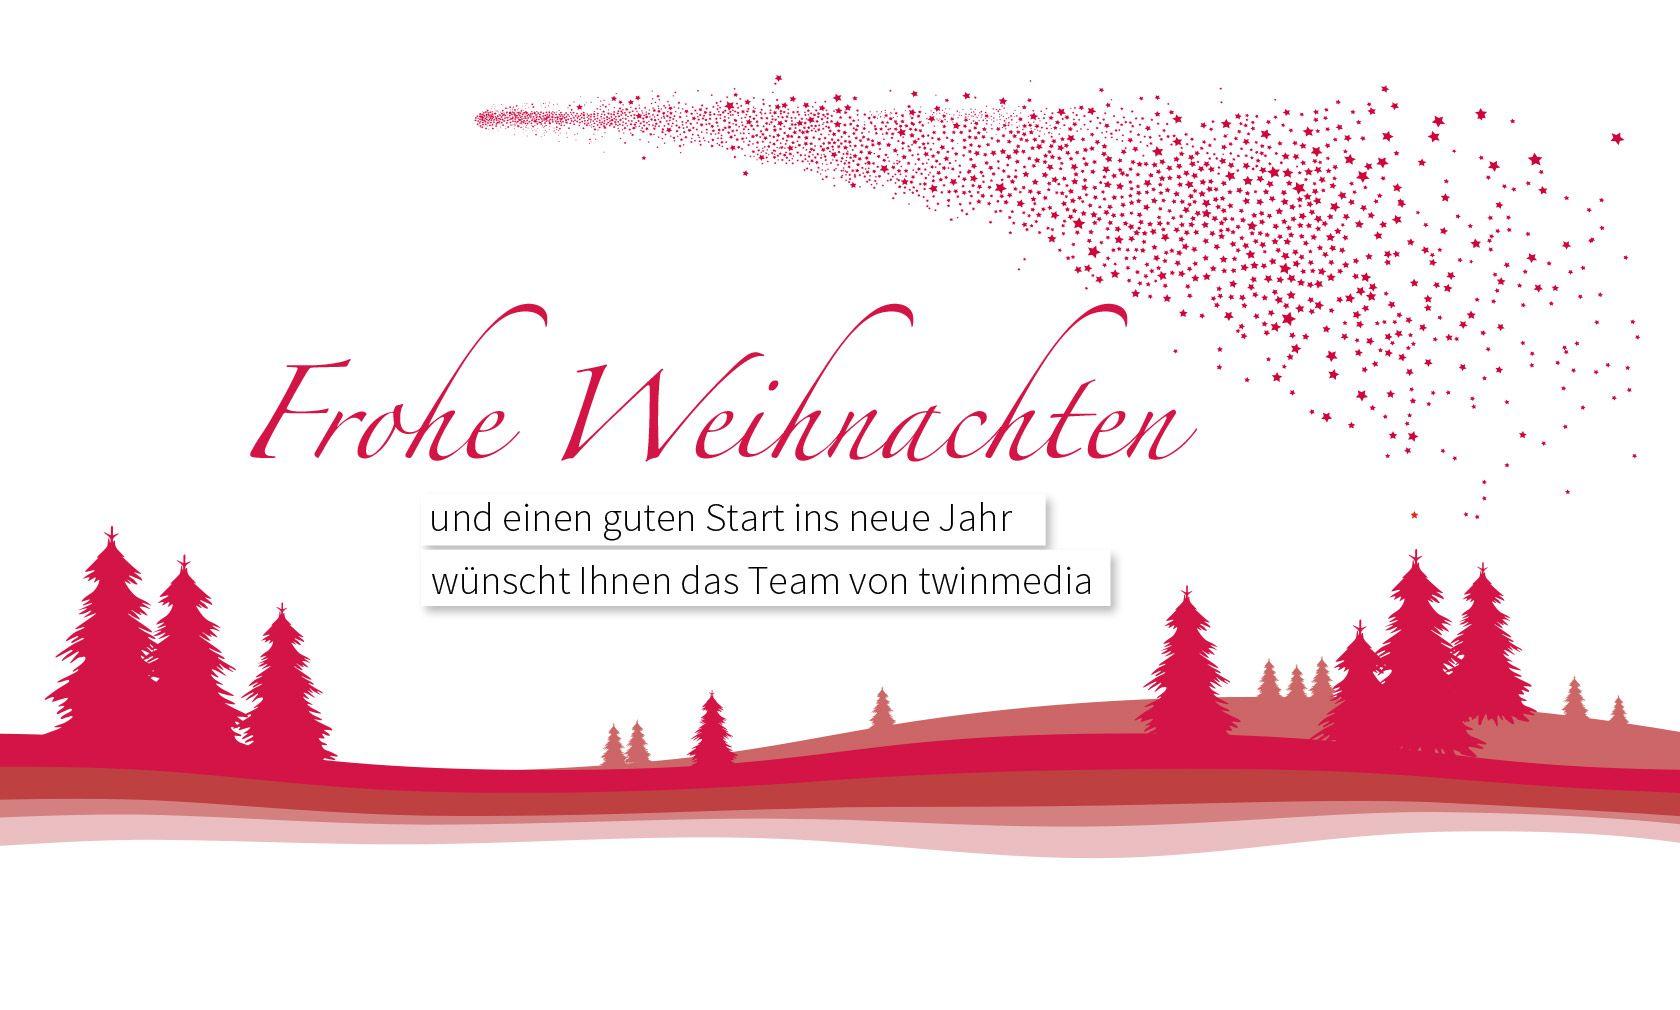 twinmedia Weihnachtsgruß. © twinmedia GmbH